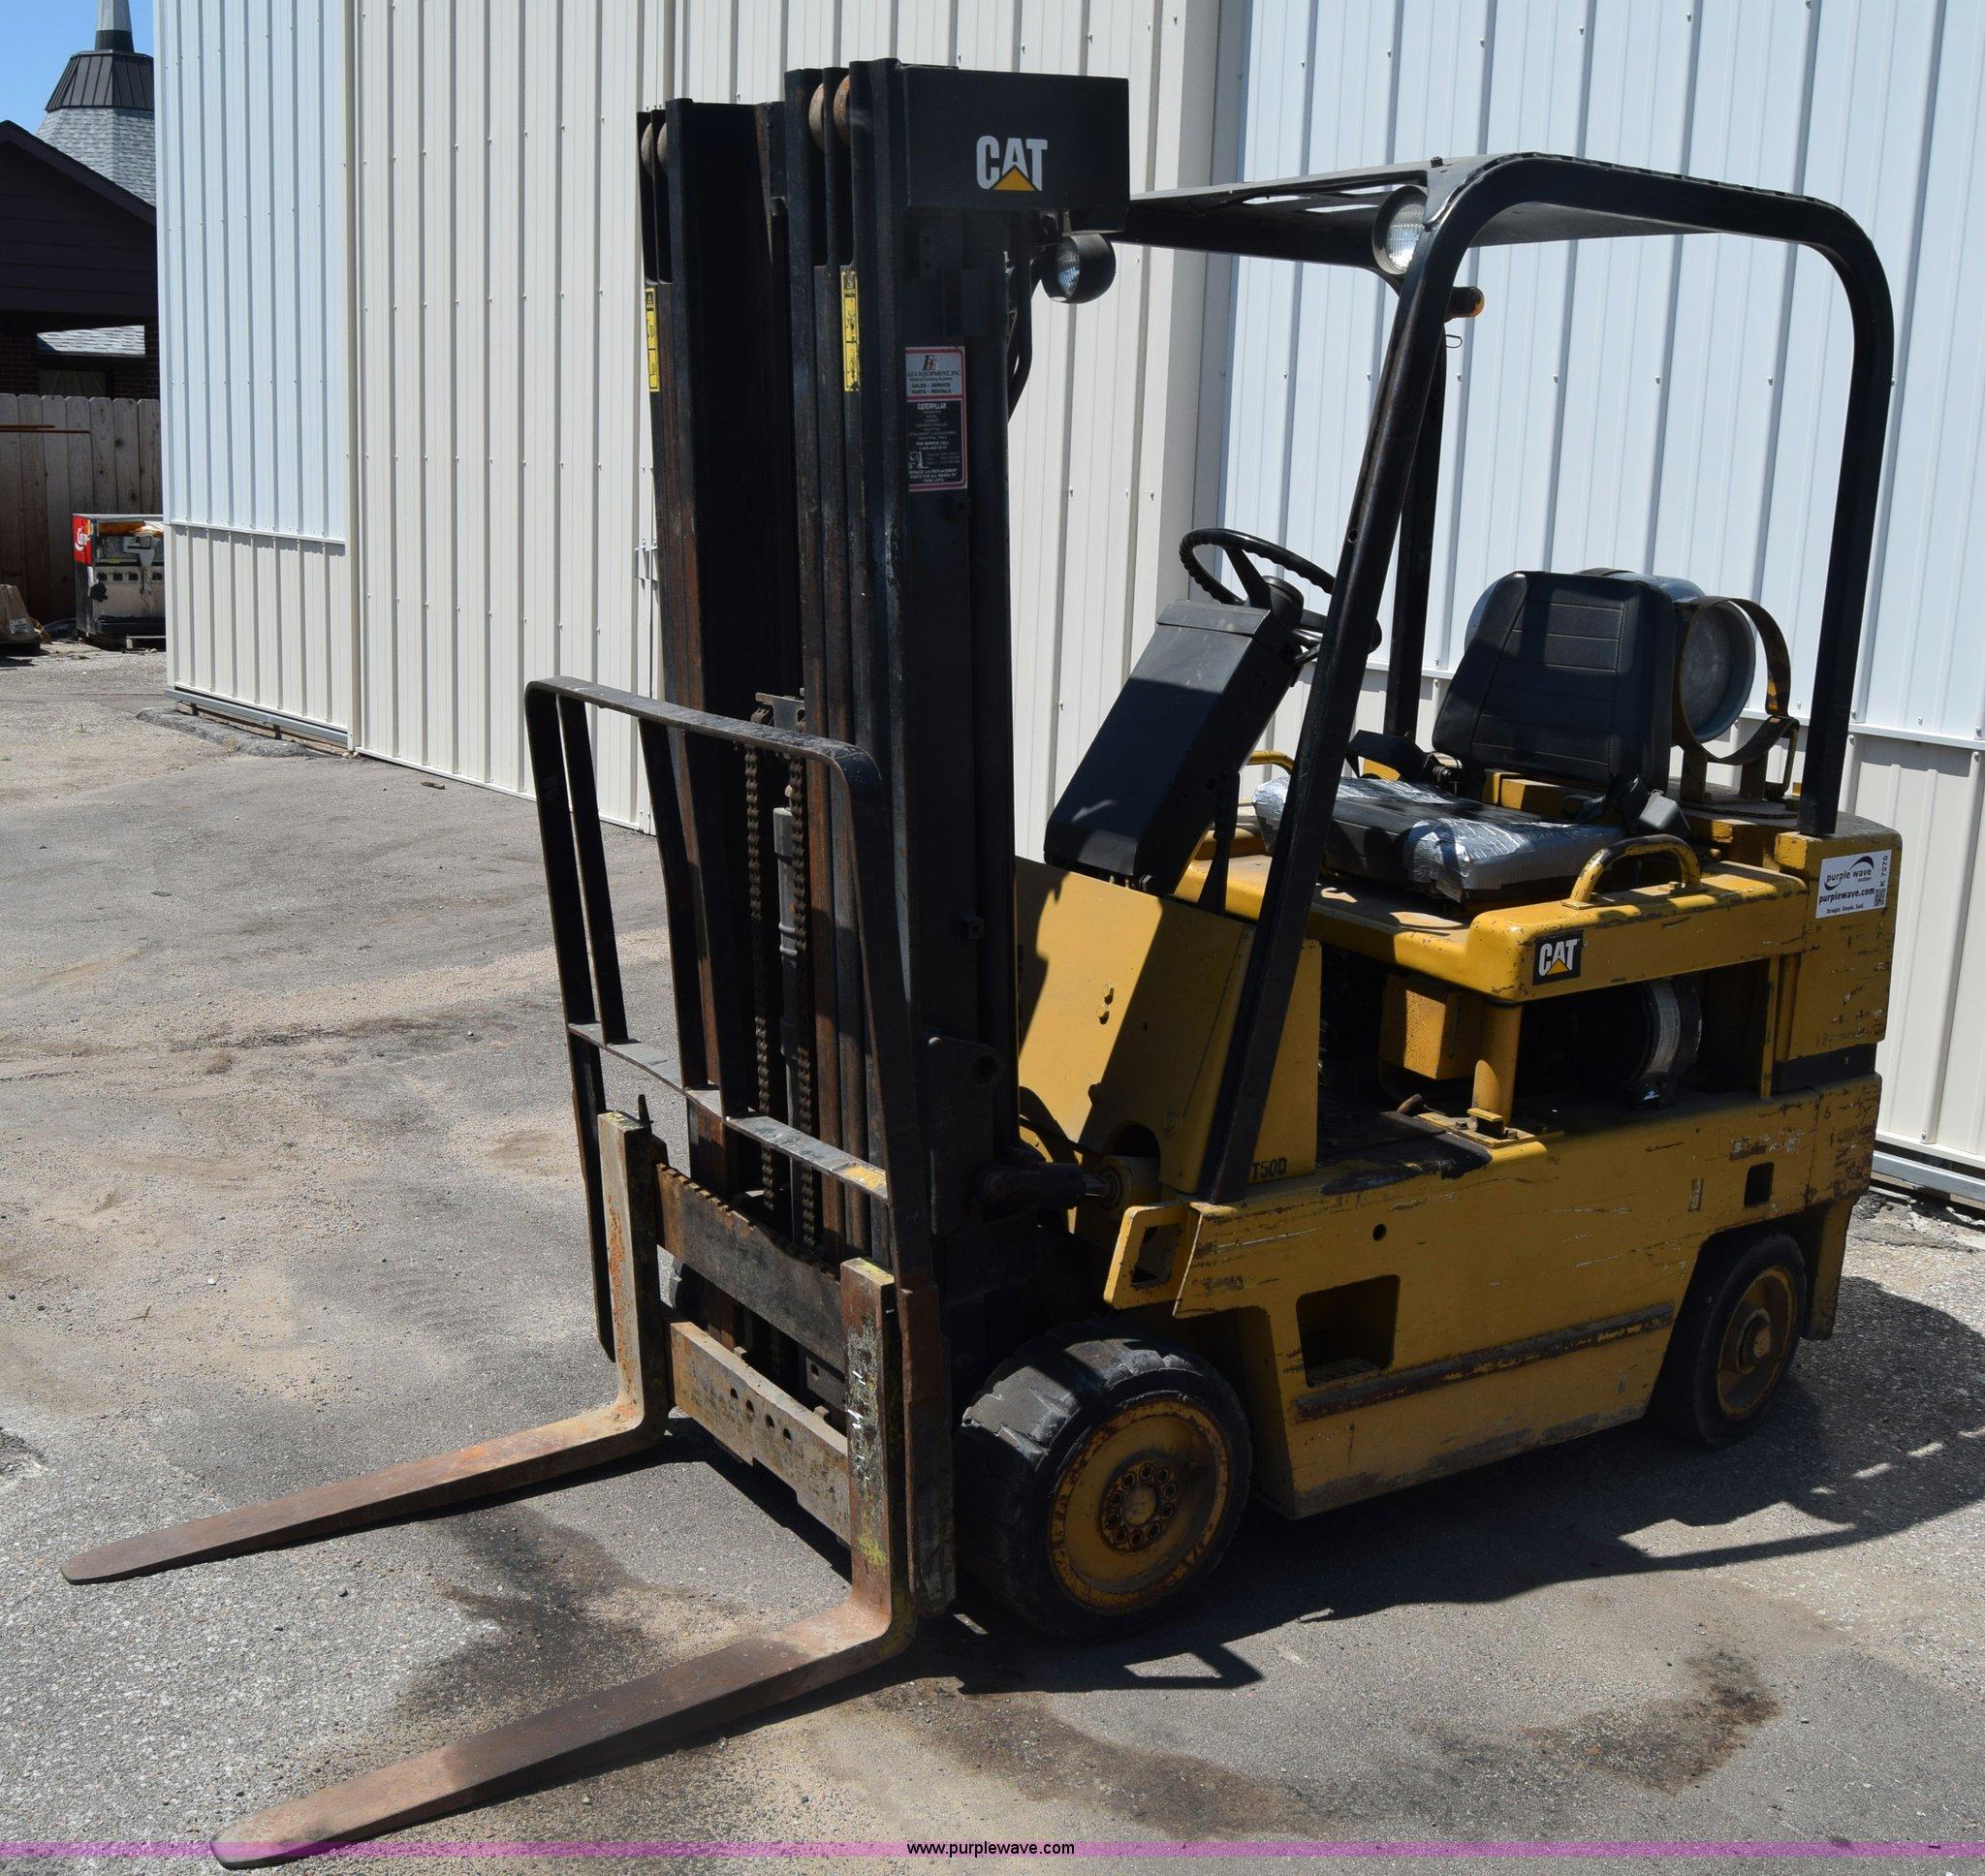 1990 Caterpillar T50D forklift | Item K7275 | SOLD! July 20